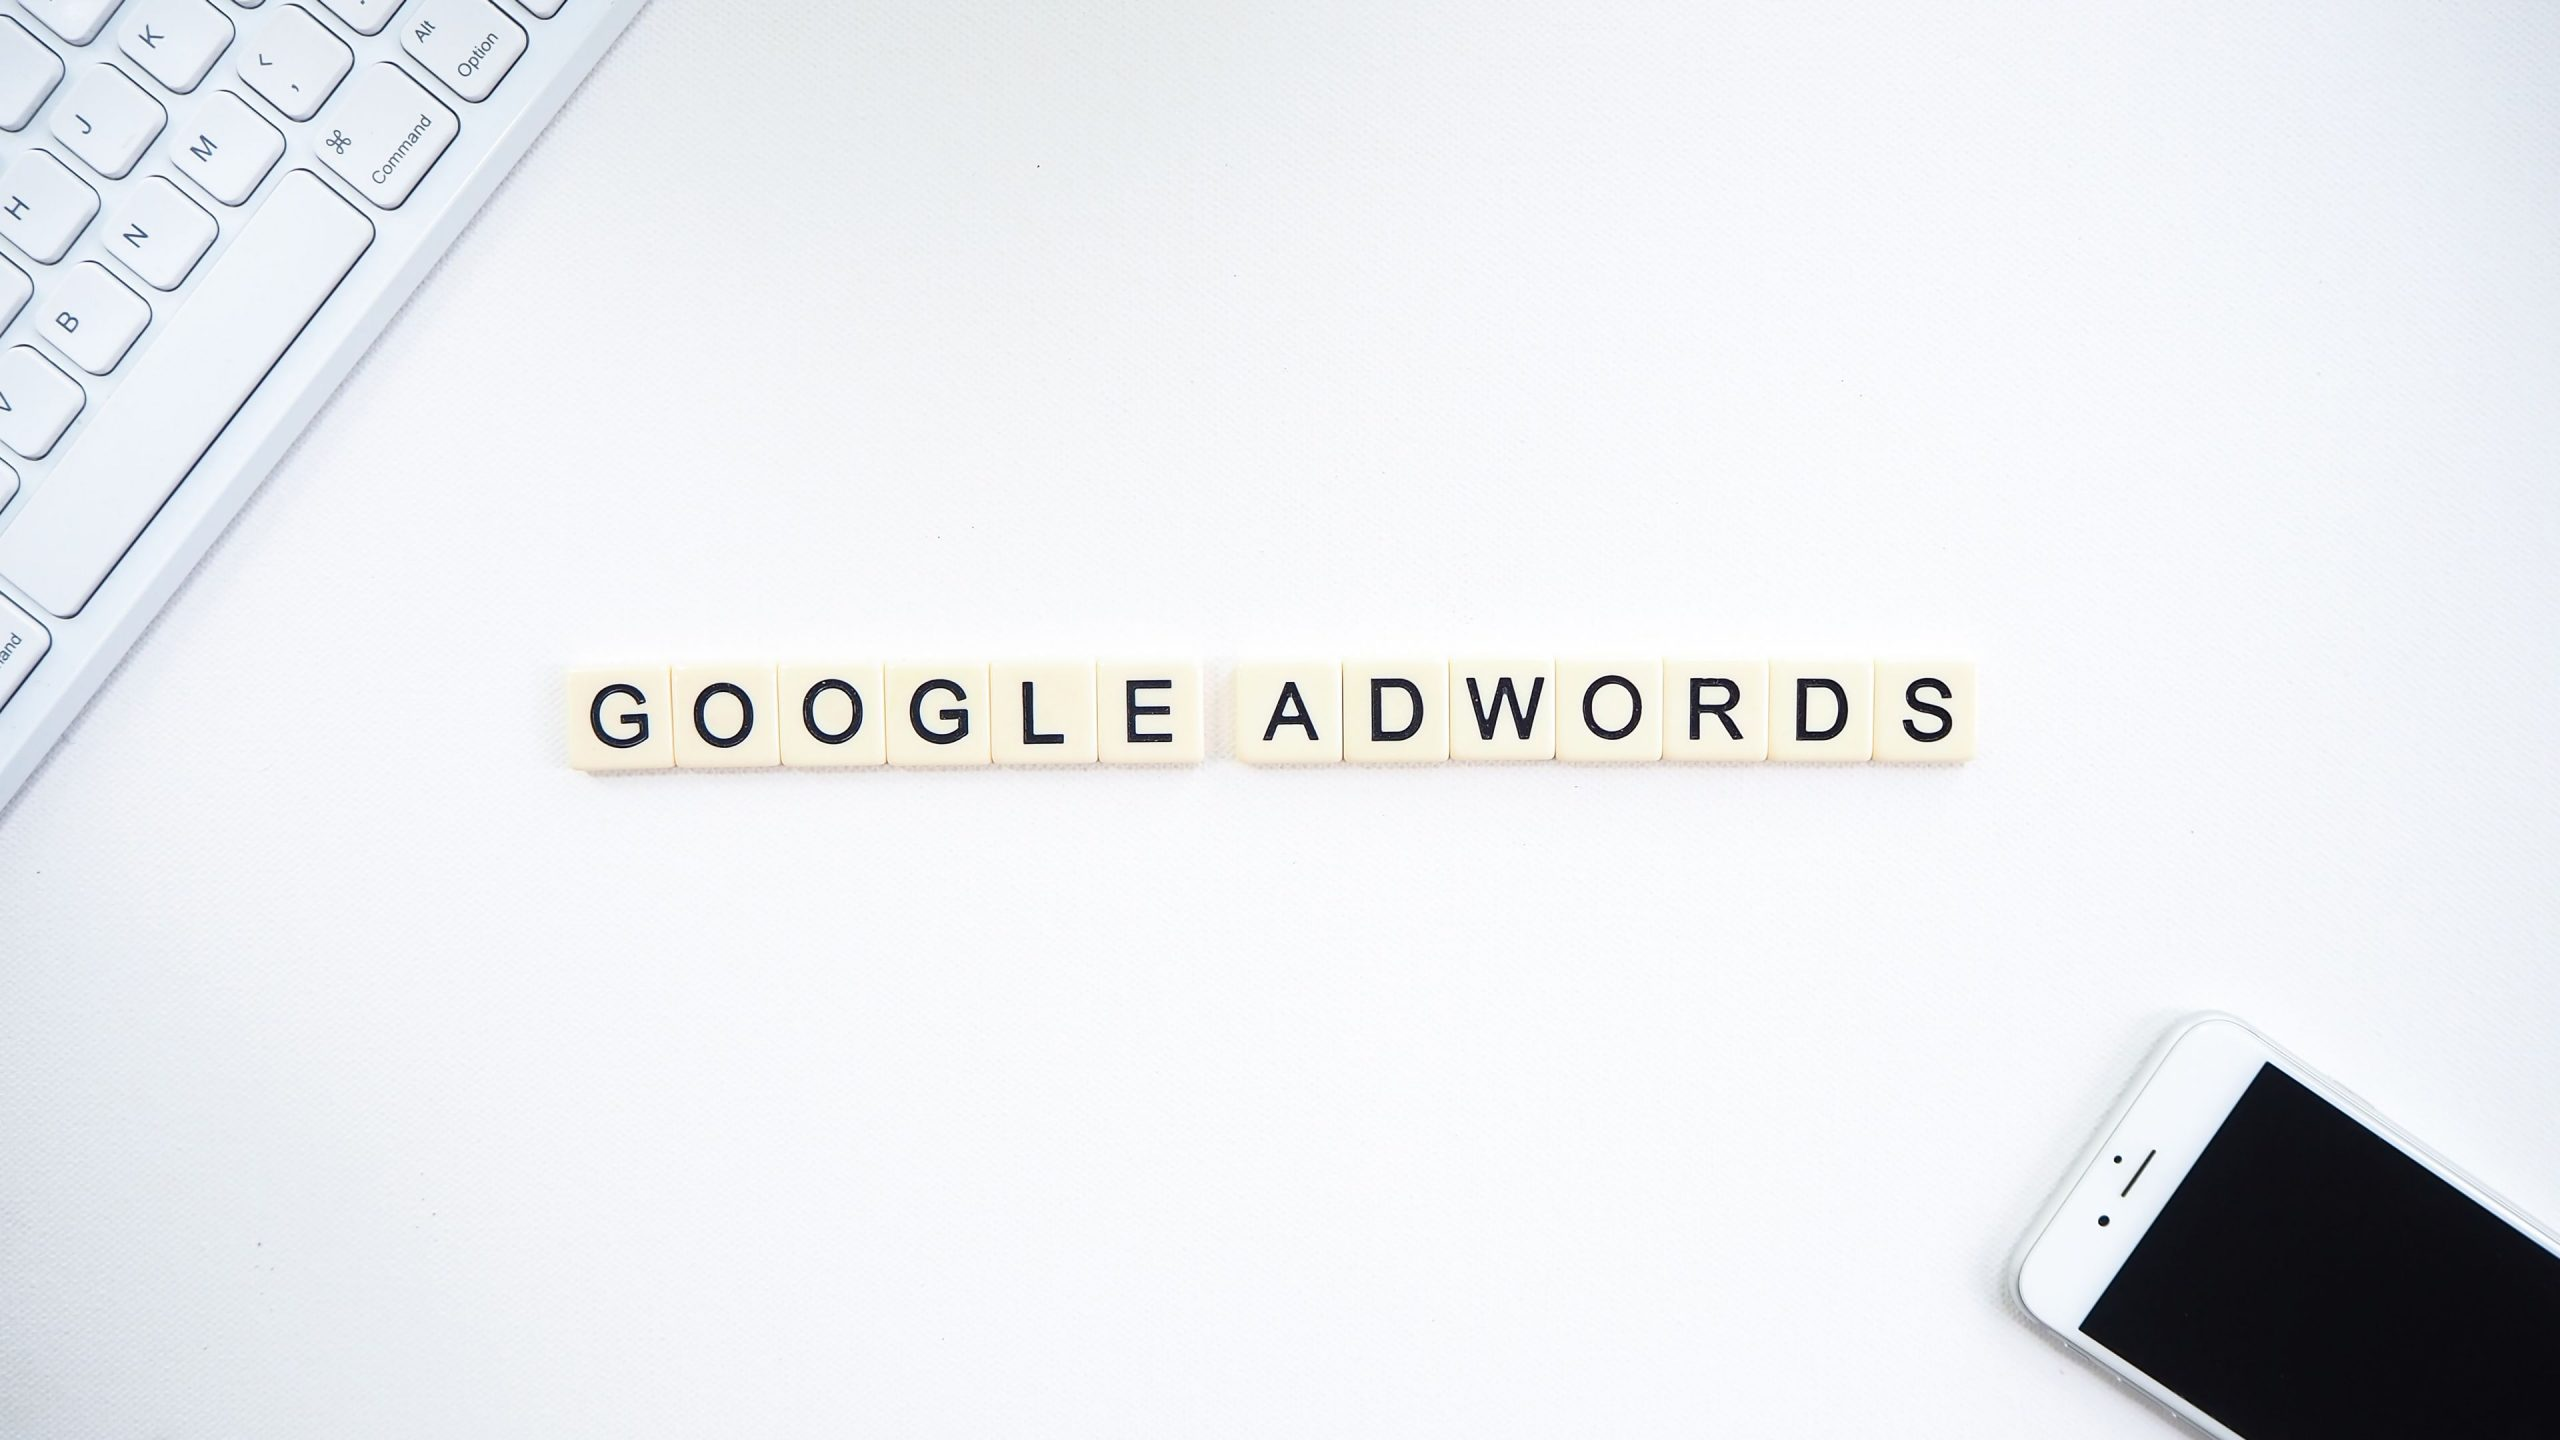 Google Adwords Company in Chadigarh